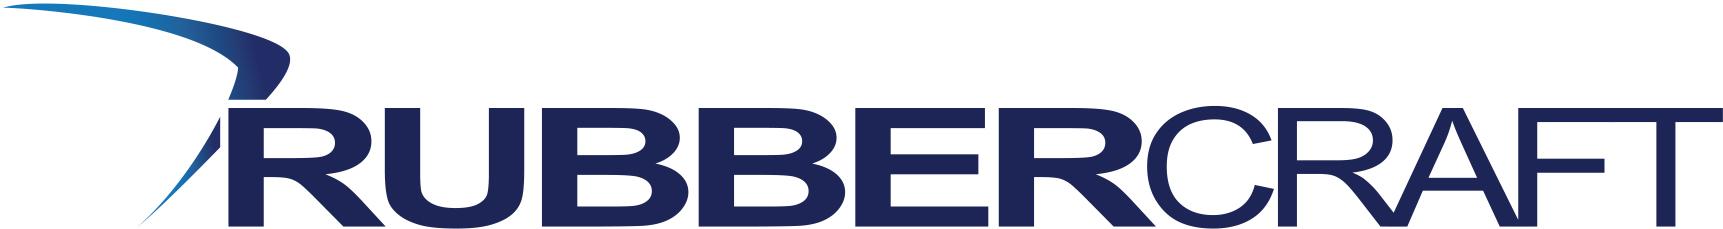 logo-rubbercraft